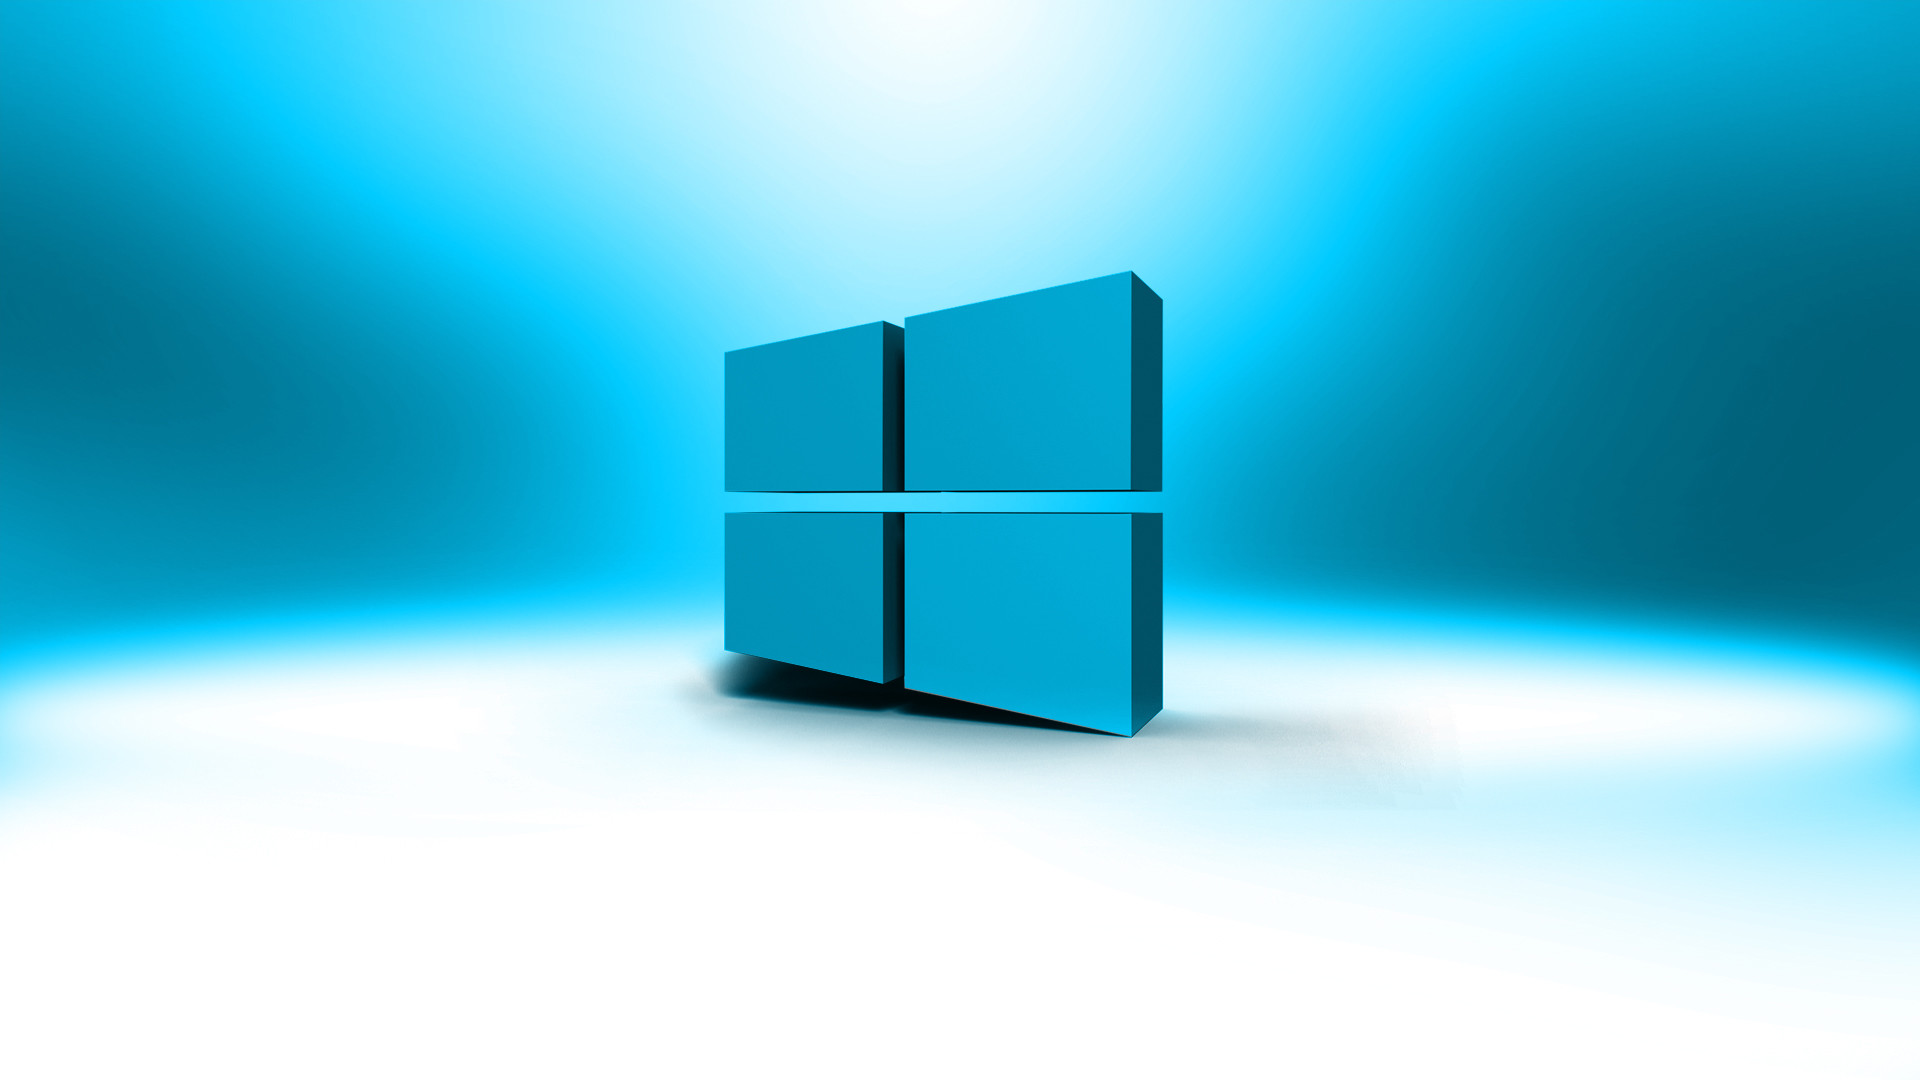 Desktop wallpaper free download for windows xp